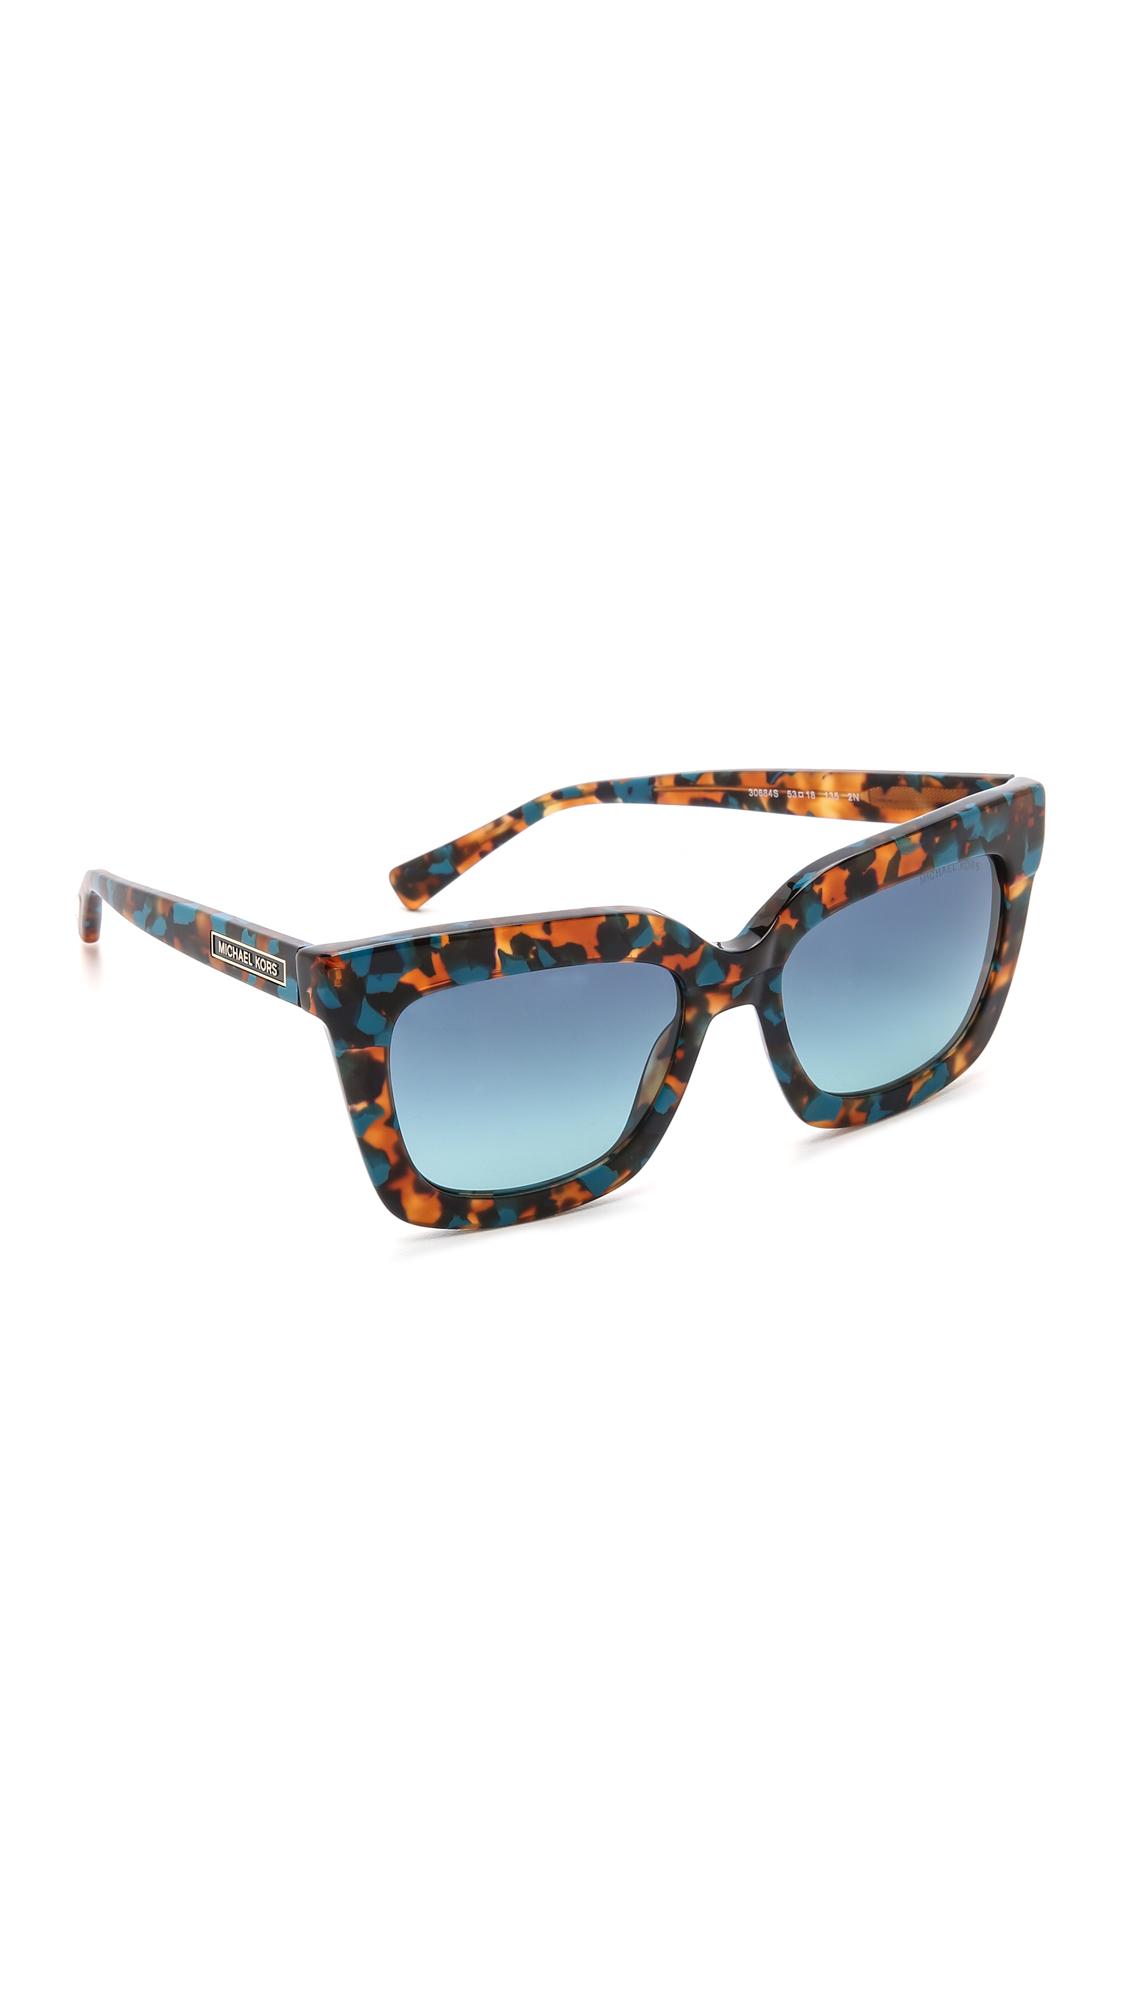 8ec1740fe0 Michael Kors Square Sunglasses - Burgundy Tortoise warm Brown in ...